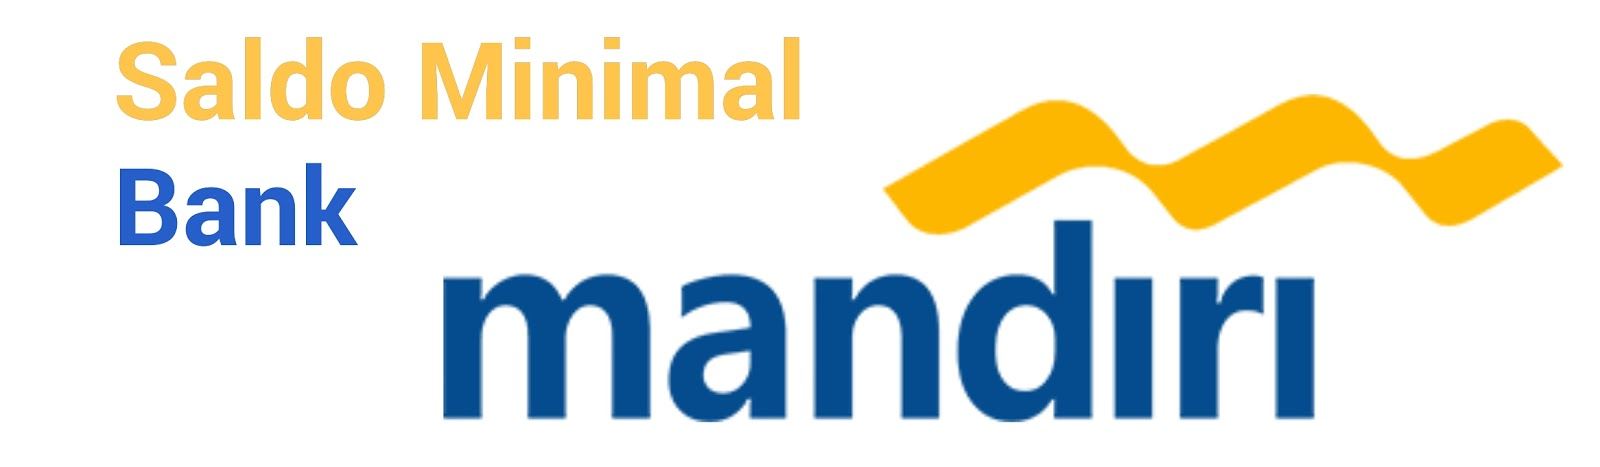 Saldo Minimal Bank Mandiri Transaksi Perbankan